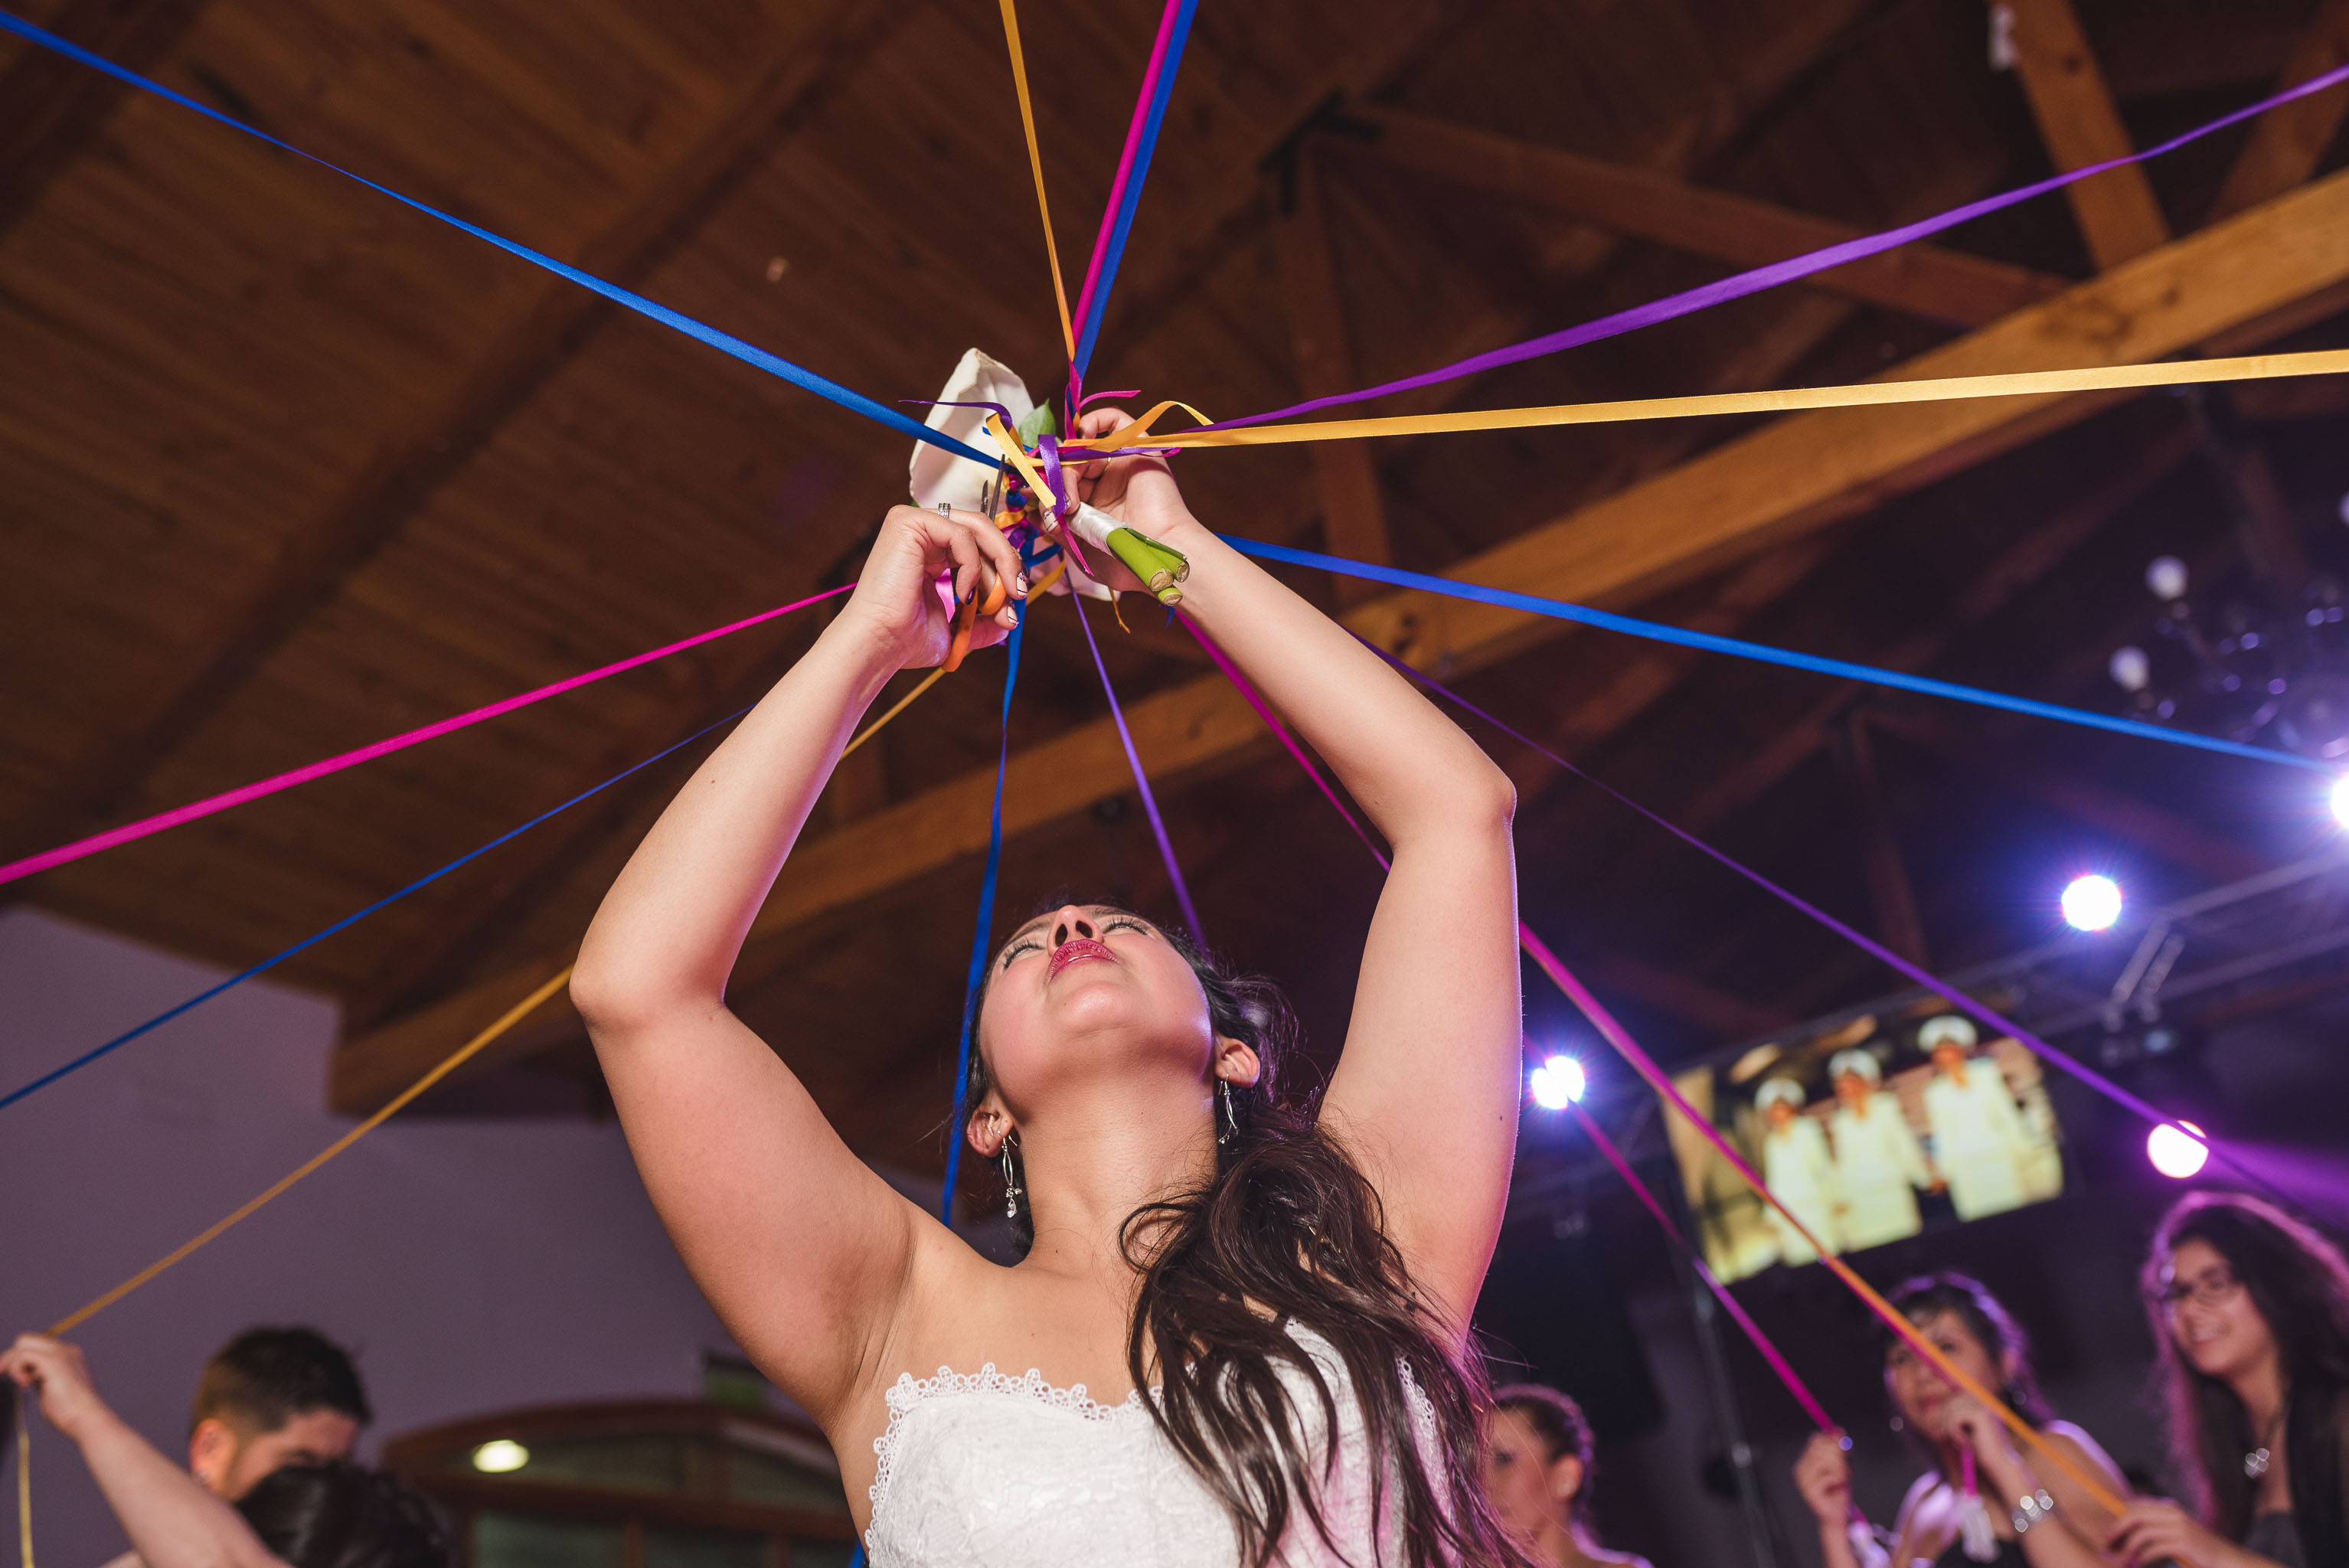 Matrimonio-centro de eventos-oliveto-santiago-fotógrafo de matrimonios-fiesta-ramo novia